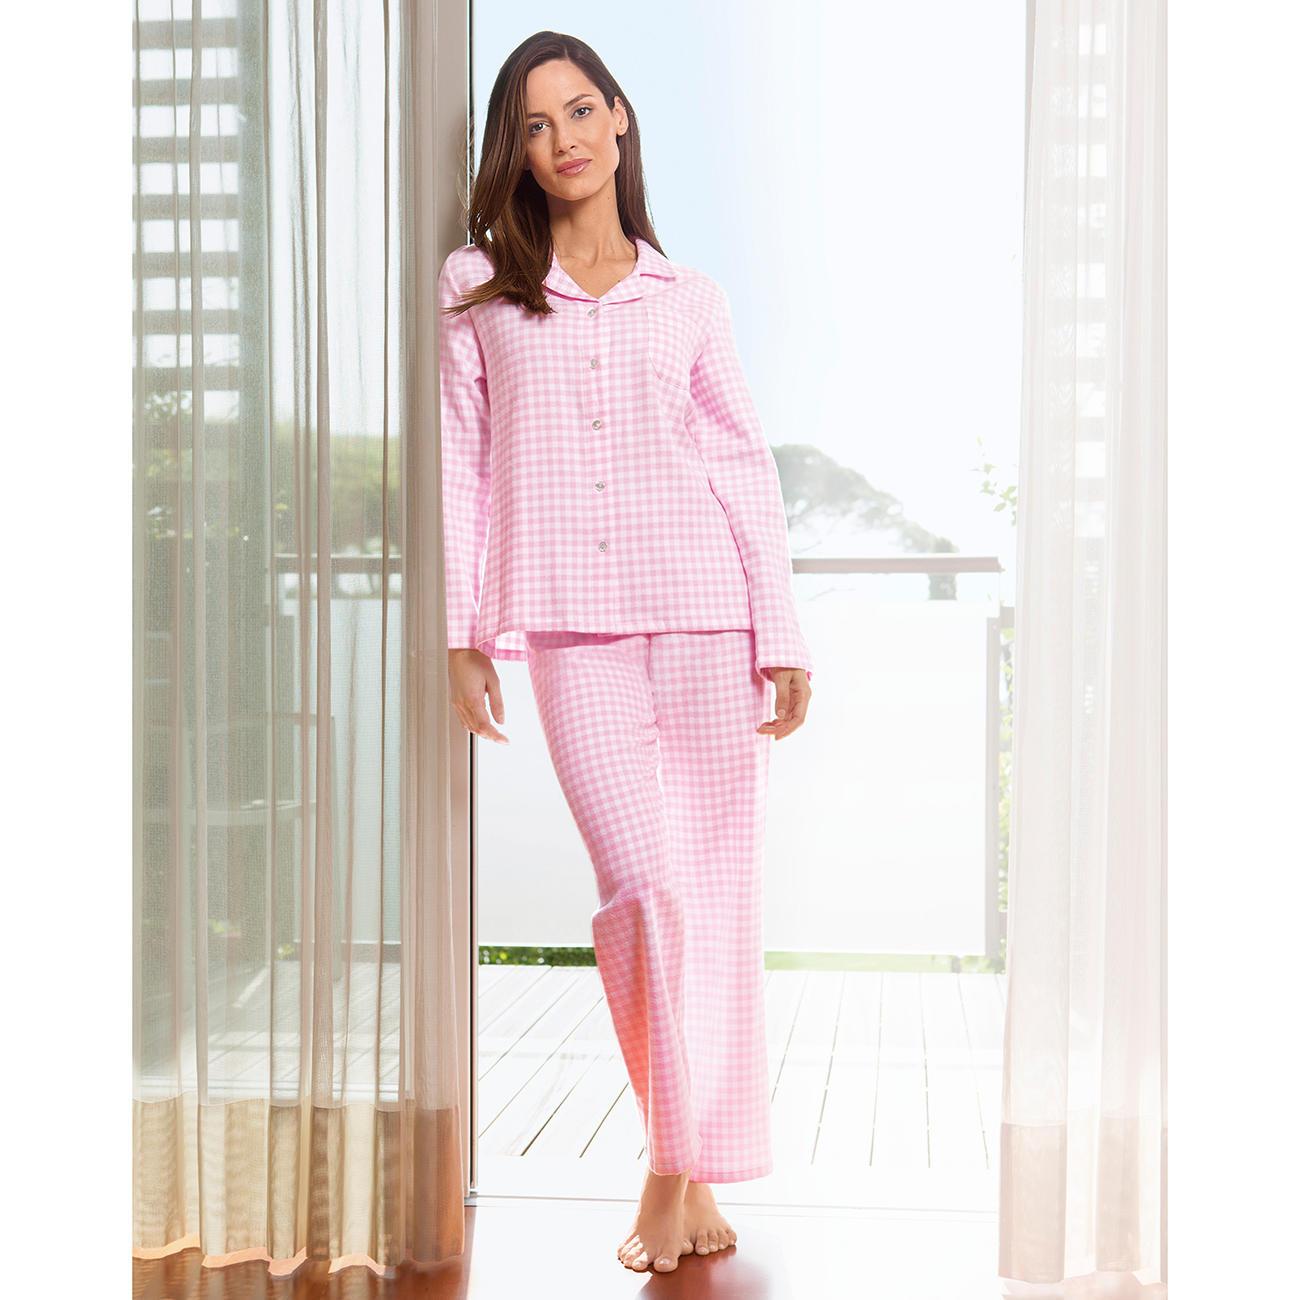 novila flanell pyjama vichykaro klassiker entdecken. Black Bedroom Furniture Sets. Home Design Ideas